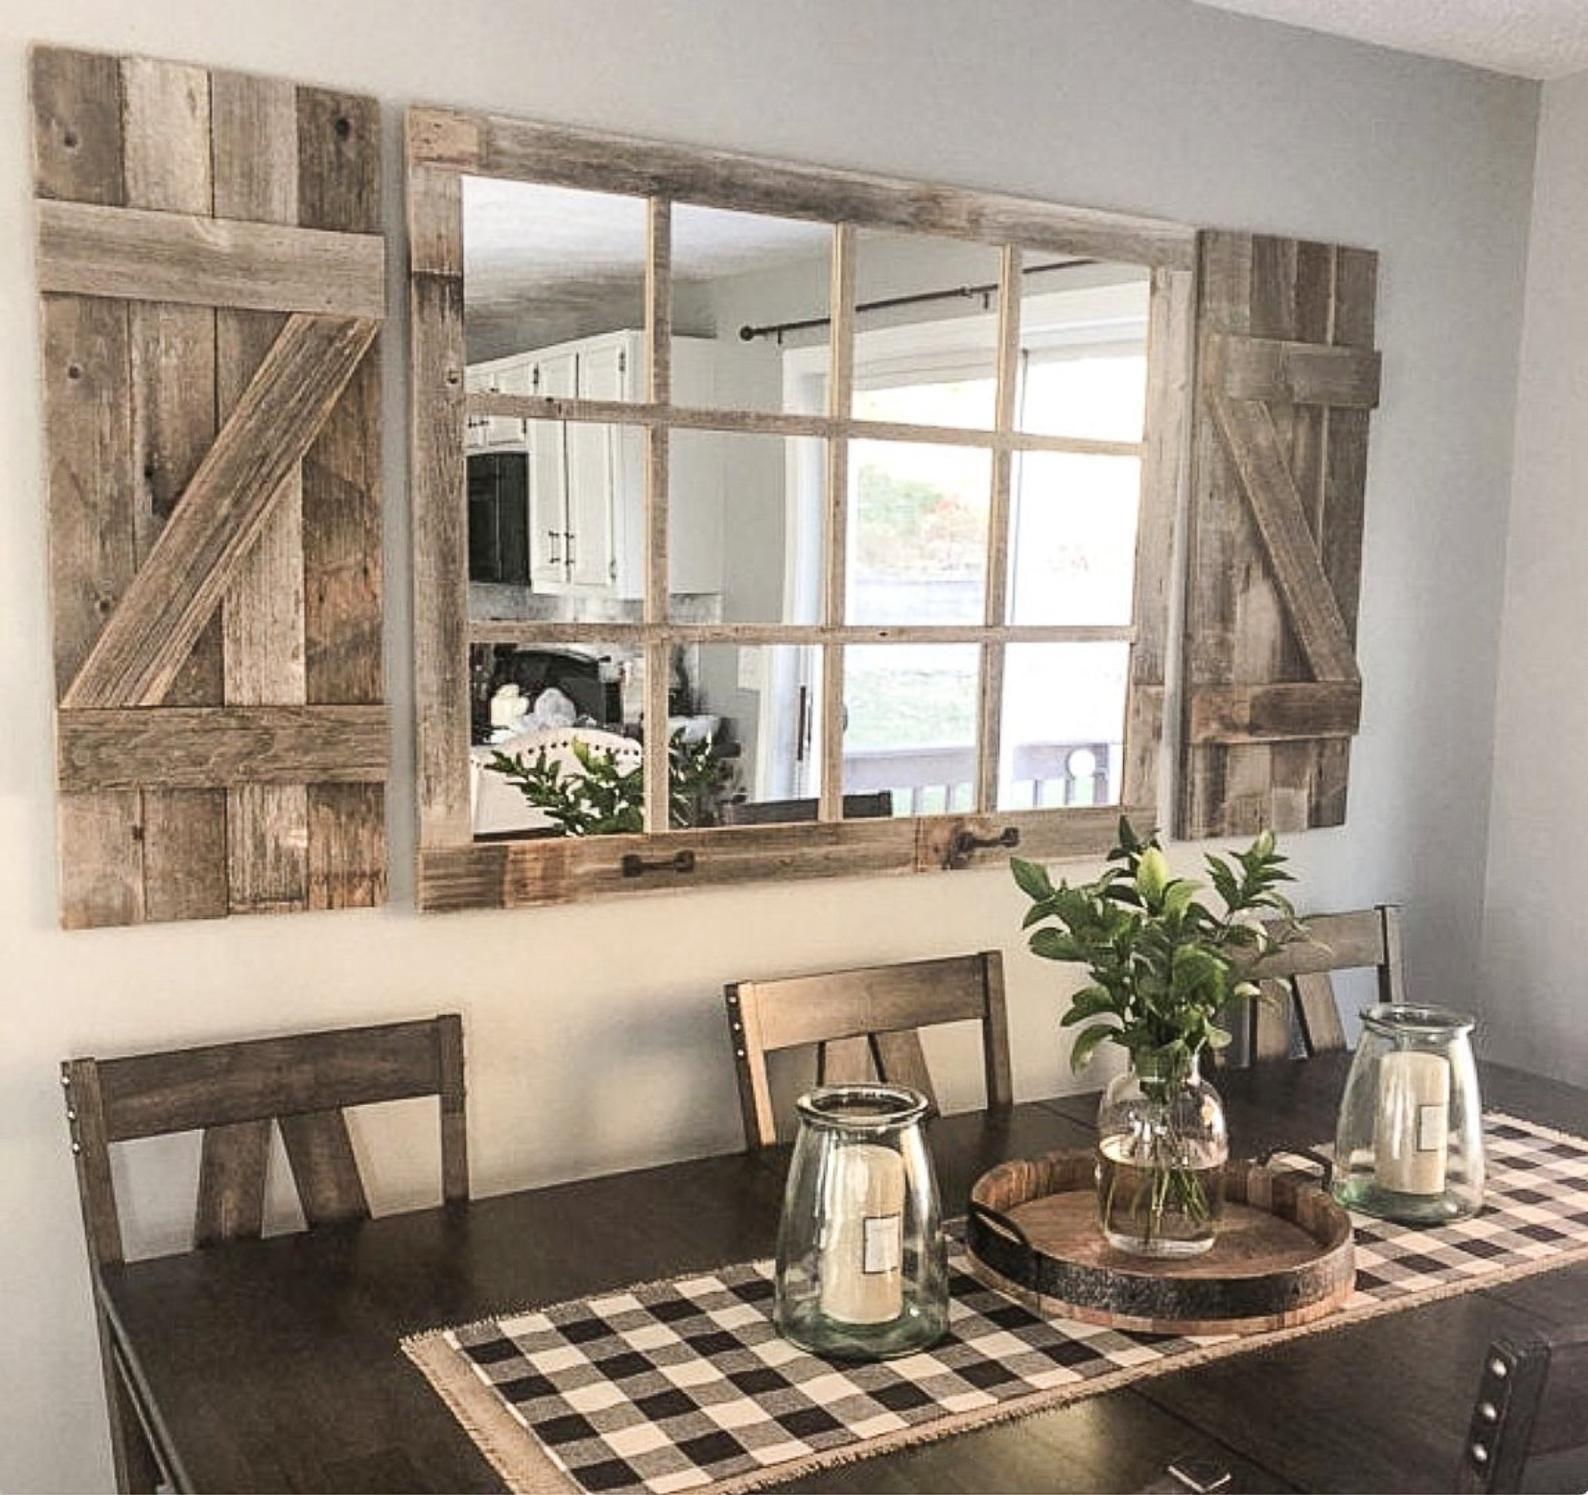 46x 36 farmhouse wall decor window mirror rustic